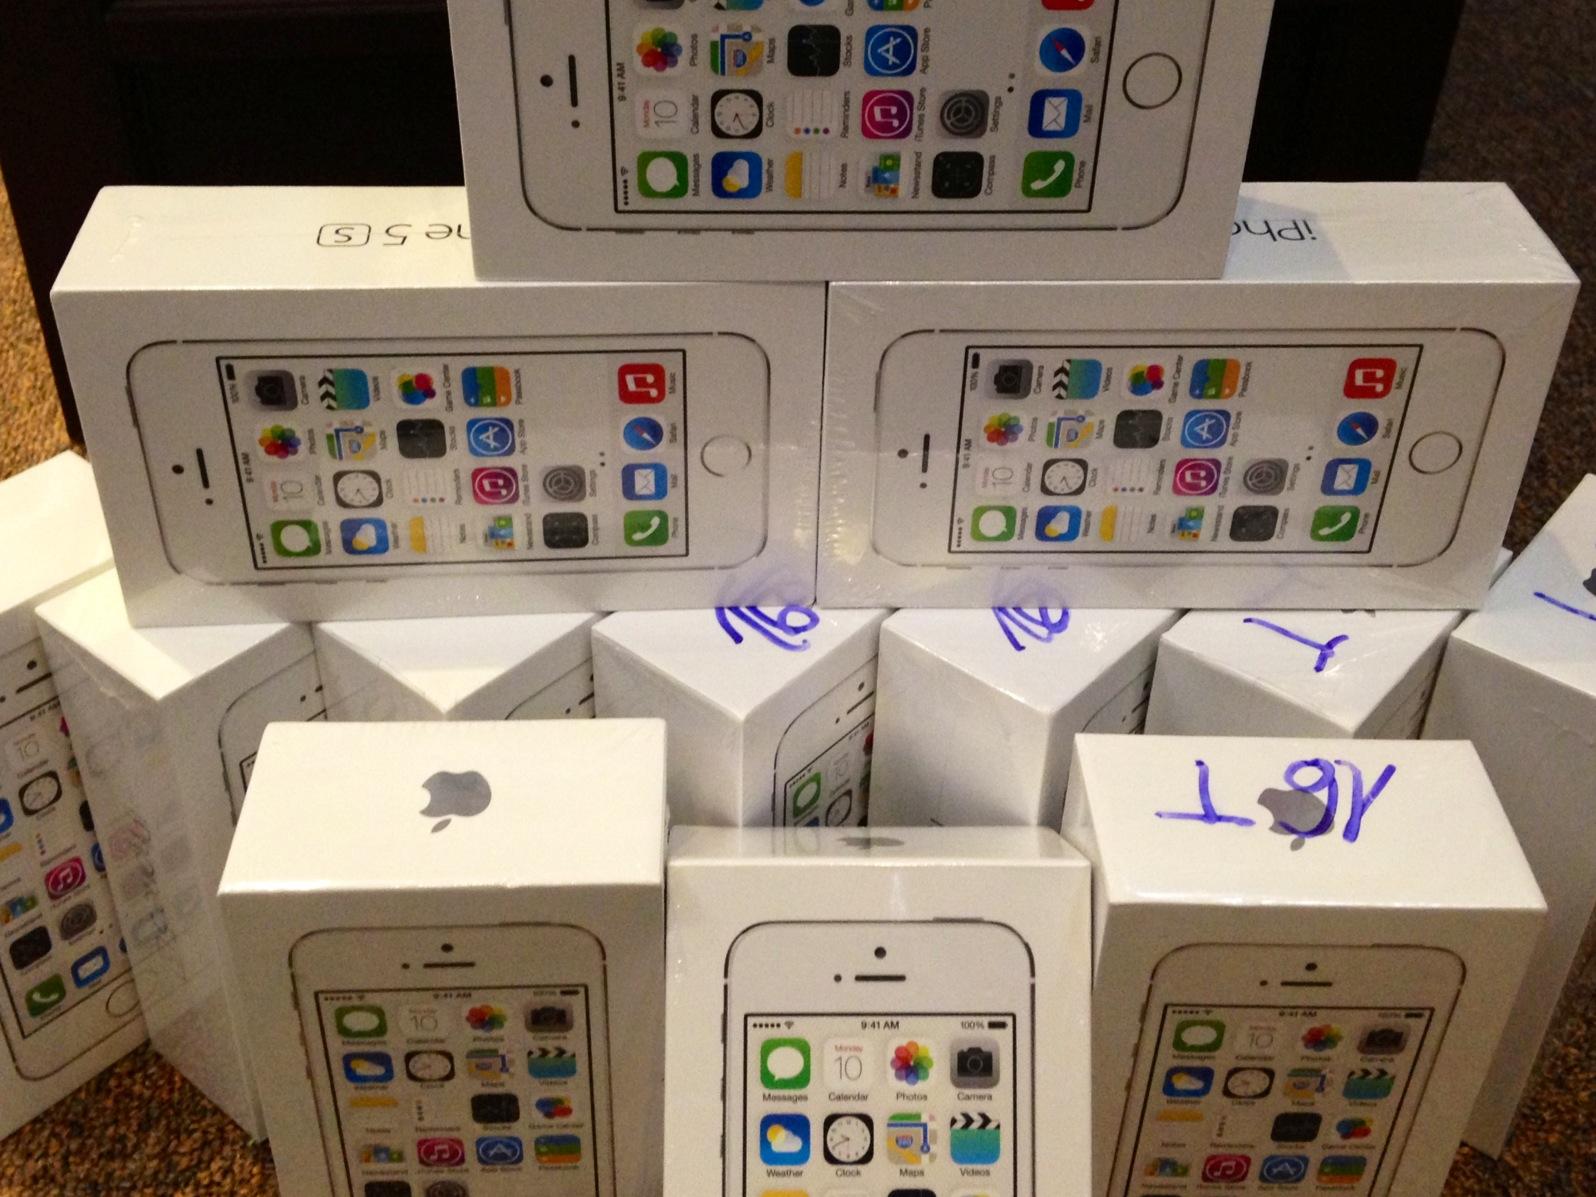 Apple-Iphone-5s-16GB-32GB-64GB-amp-Apple-macbook-pro-Original-Factory-Sealed-In-Box-Unlocked-53c392e8291002d26c56.jpg